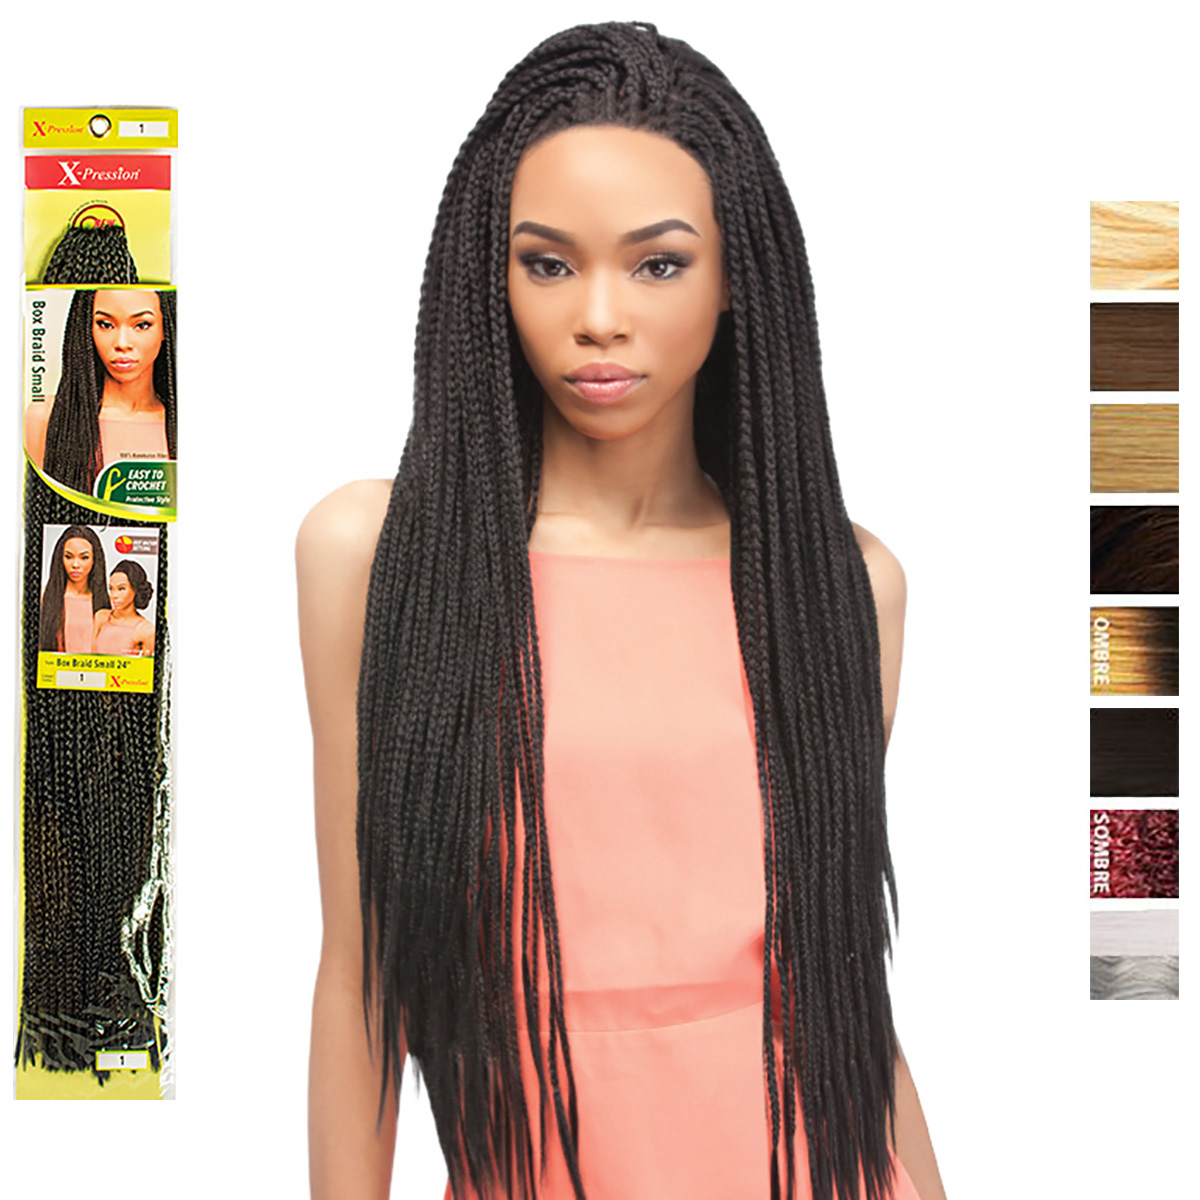 Afro shop munchen haarverlangerung